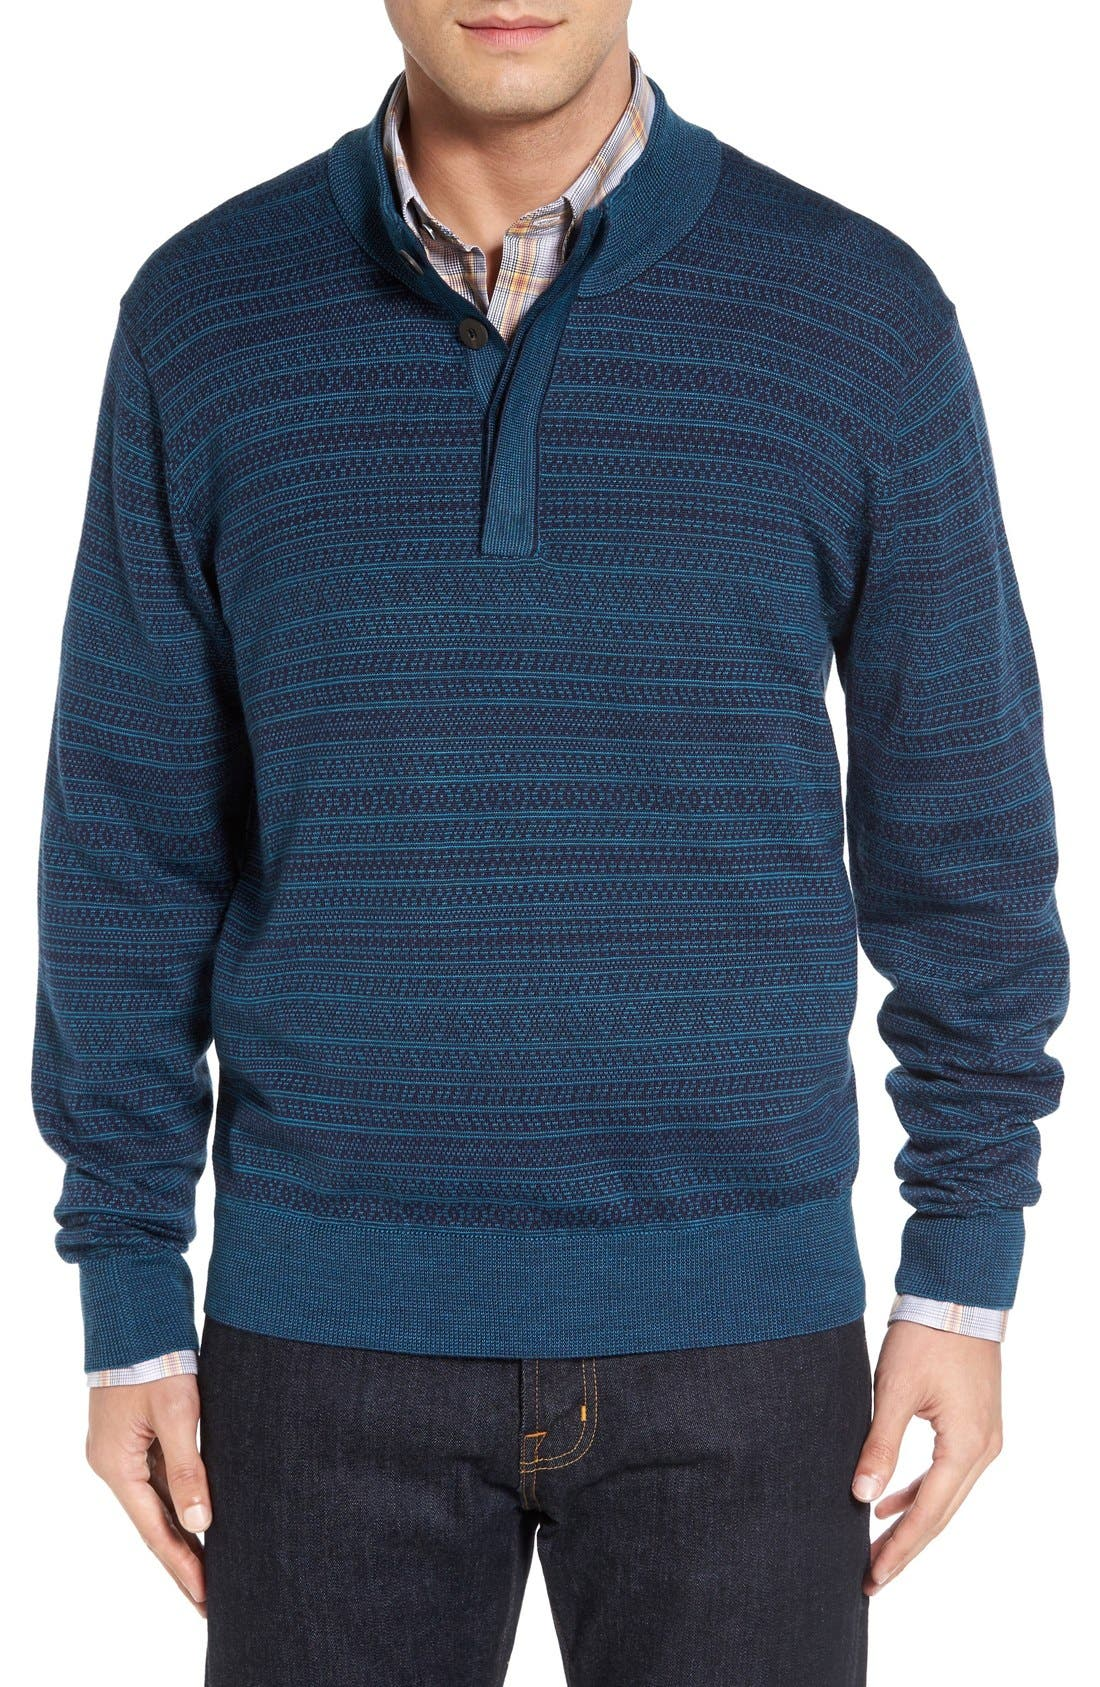 'Douglas Forest' Jacquard Wool Blend Sweater,                         Main,                         color,